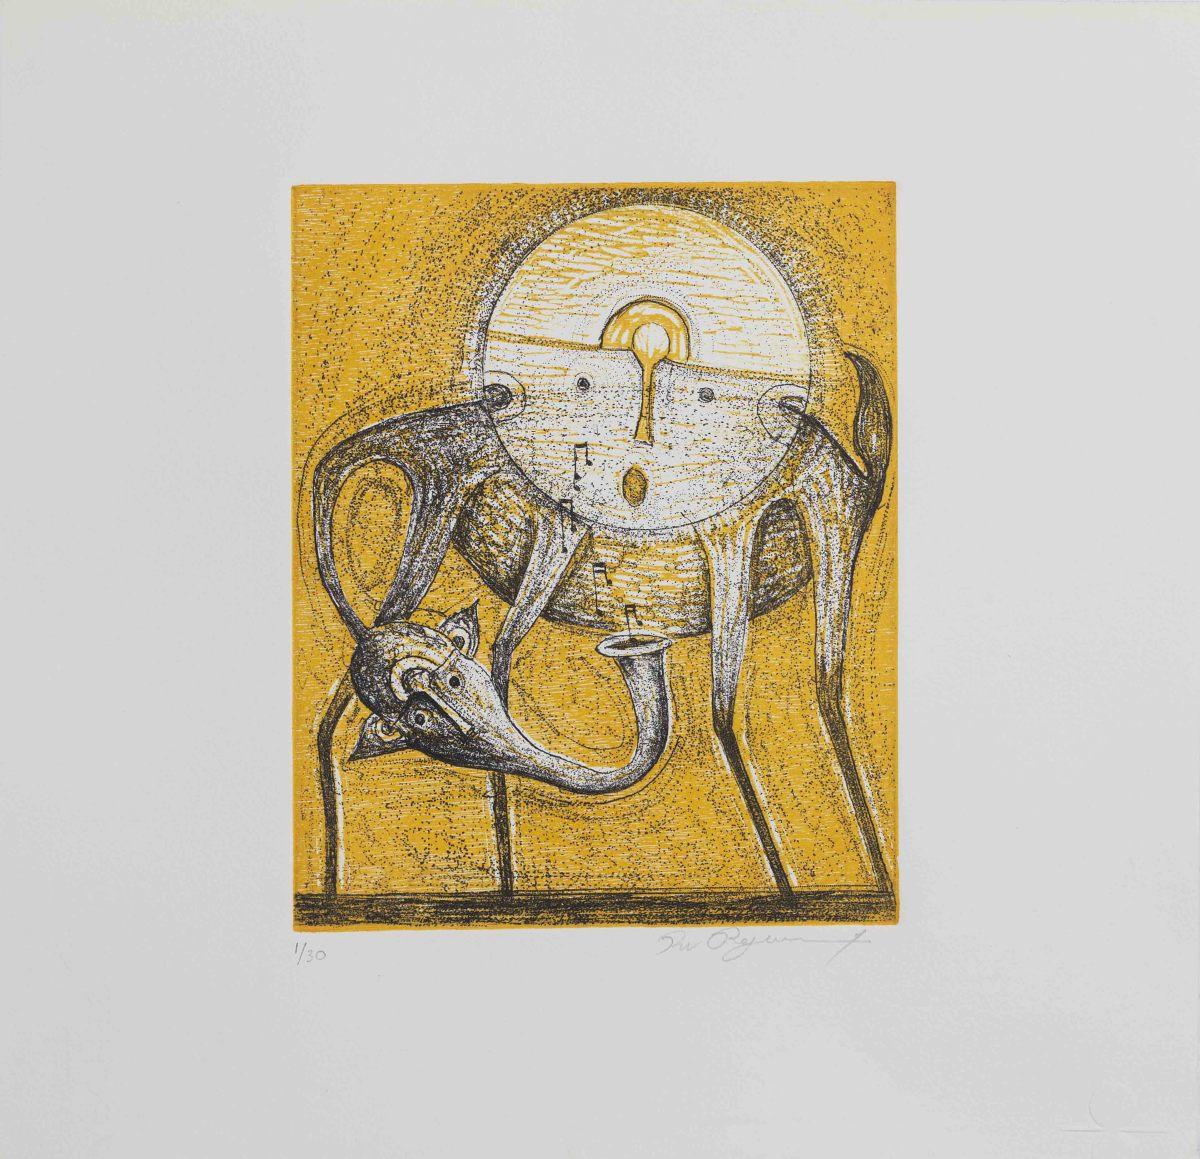 Rolando Rojas, La Carga, Lithograph , 15.7 x 17.7 in.